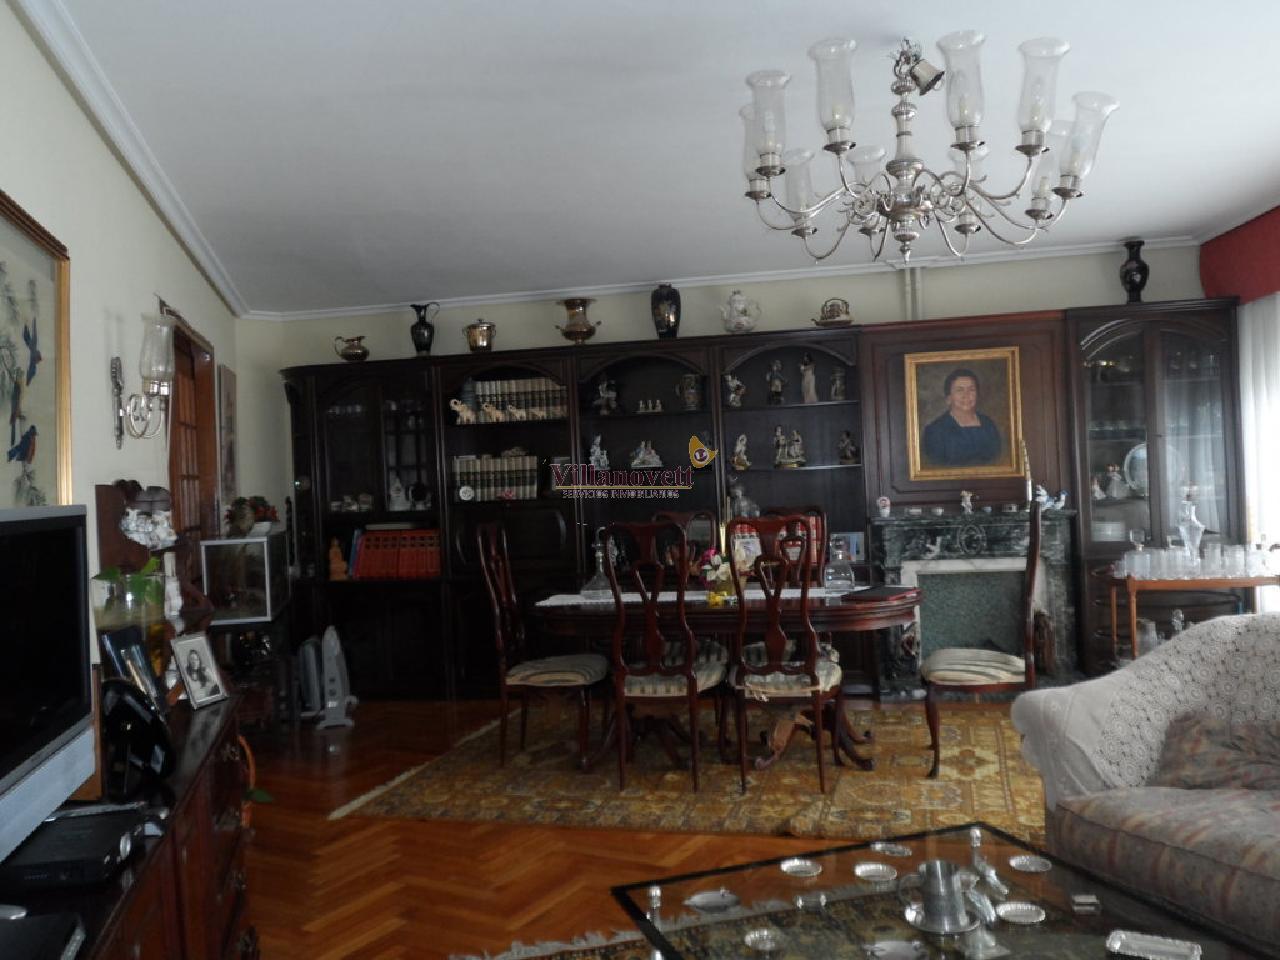 Villanovett comprar piso en vigo pontevedra ref i000047 p001587 - Piso cristal vigo ...